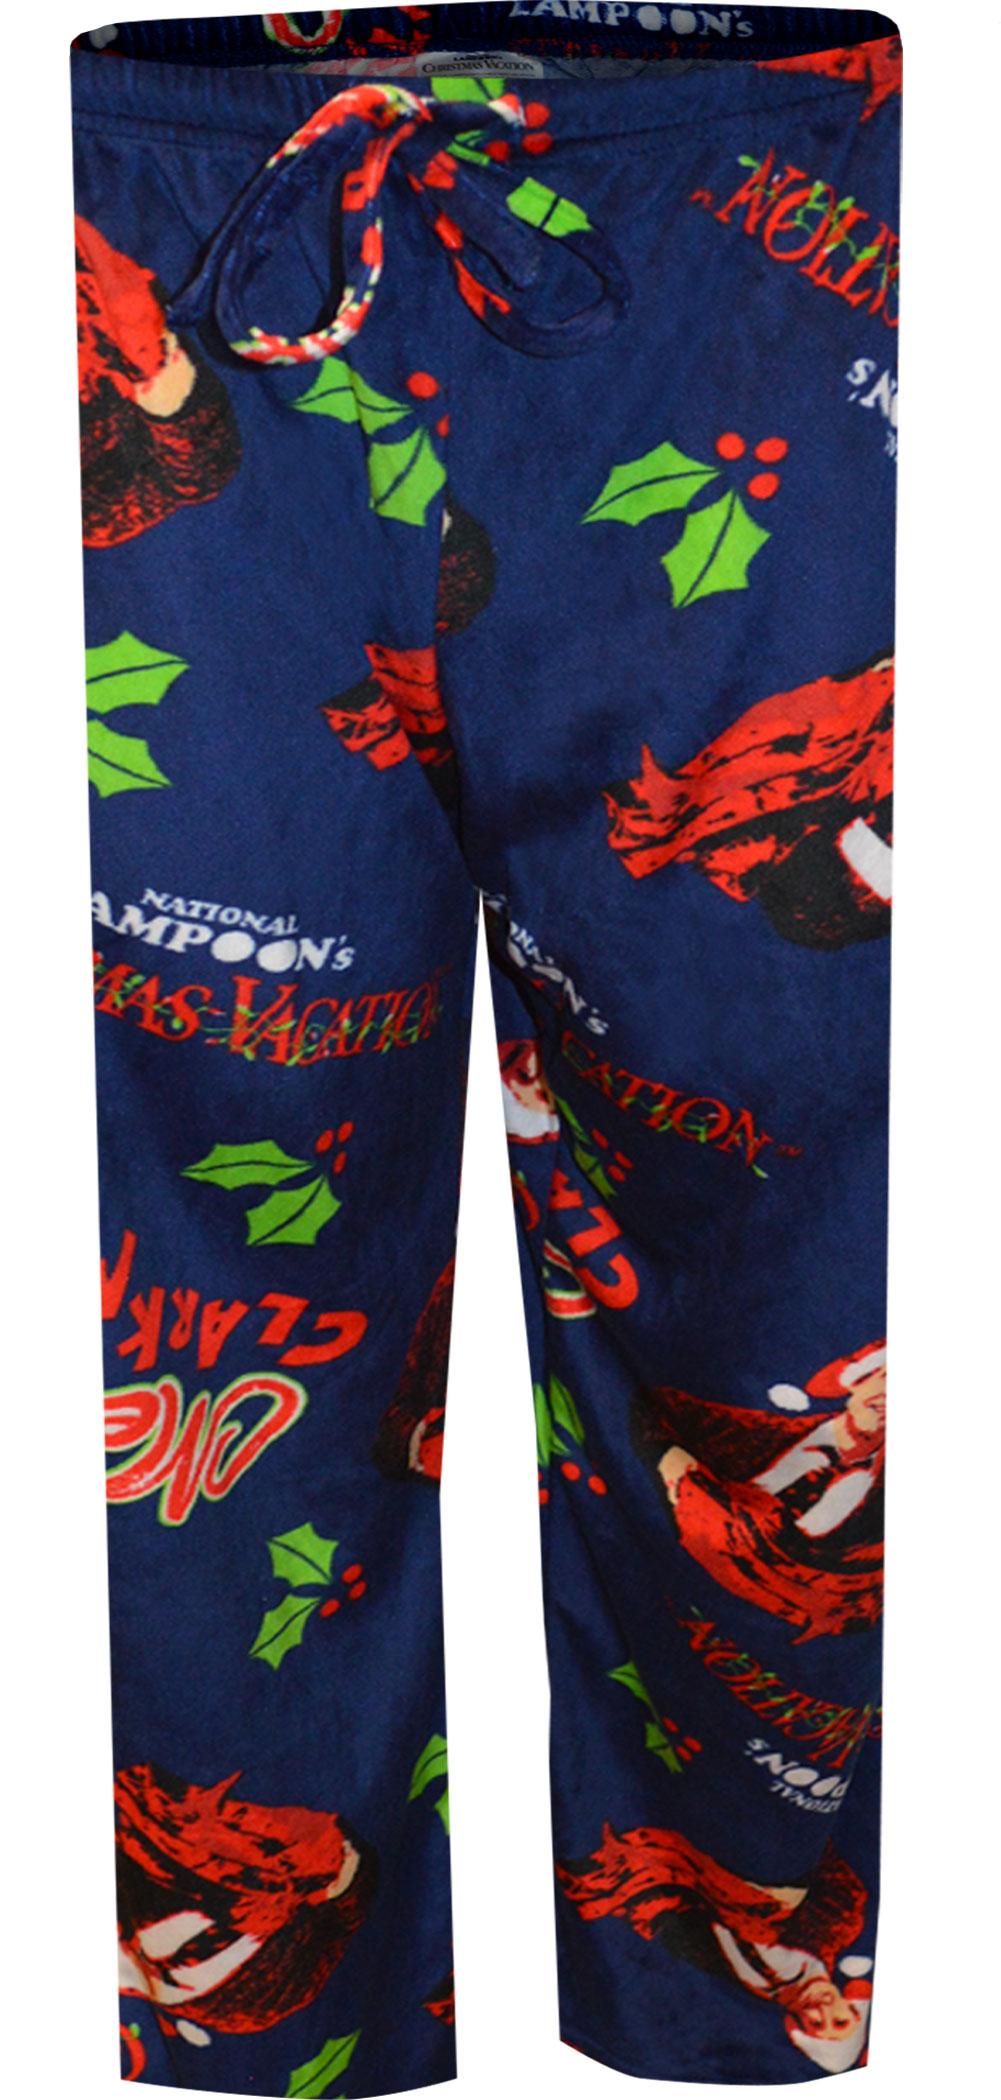 Image of Christmas Vacation Merry Clarkmas Silky Fleece Lounge Pants for men